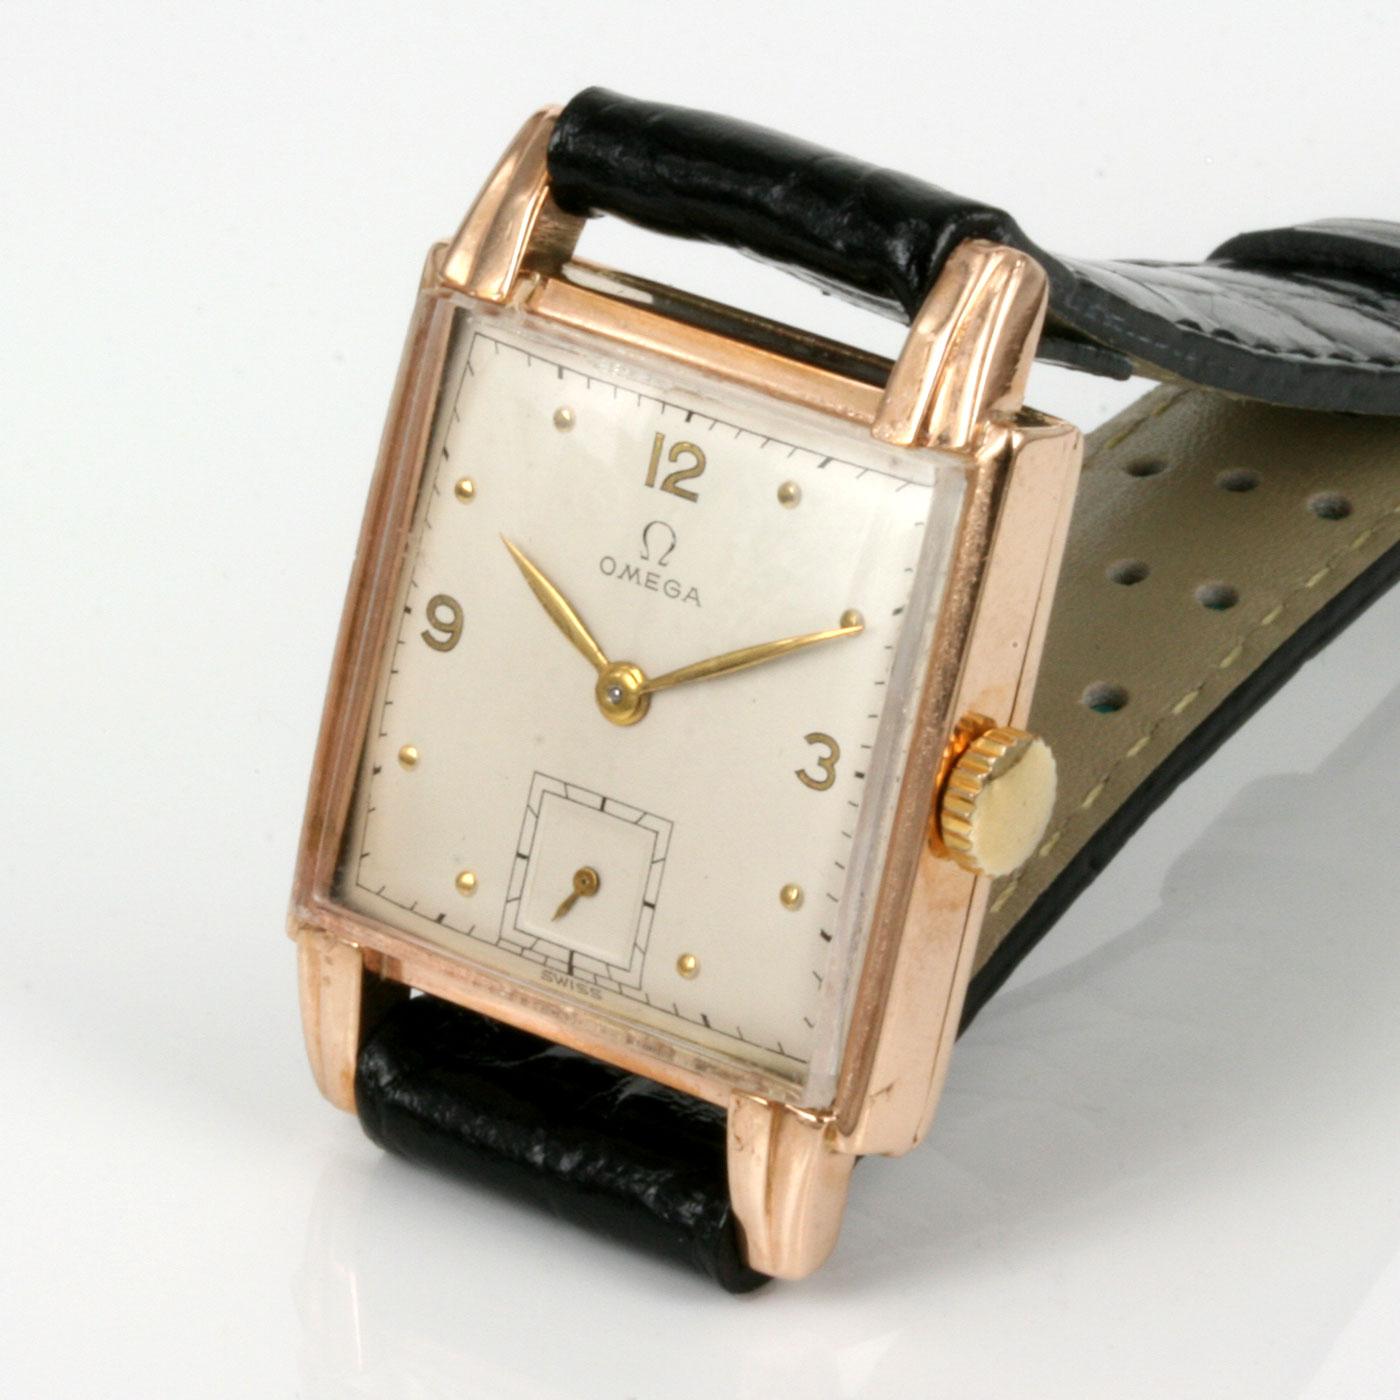 Buy 1947 rose gold vintage omega watch sold items sold omega watches sydney kalmarantiques for Omega watch vintage